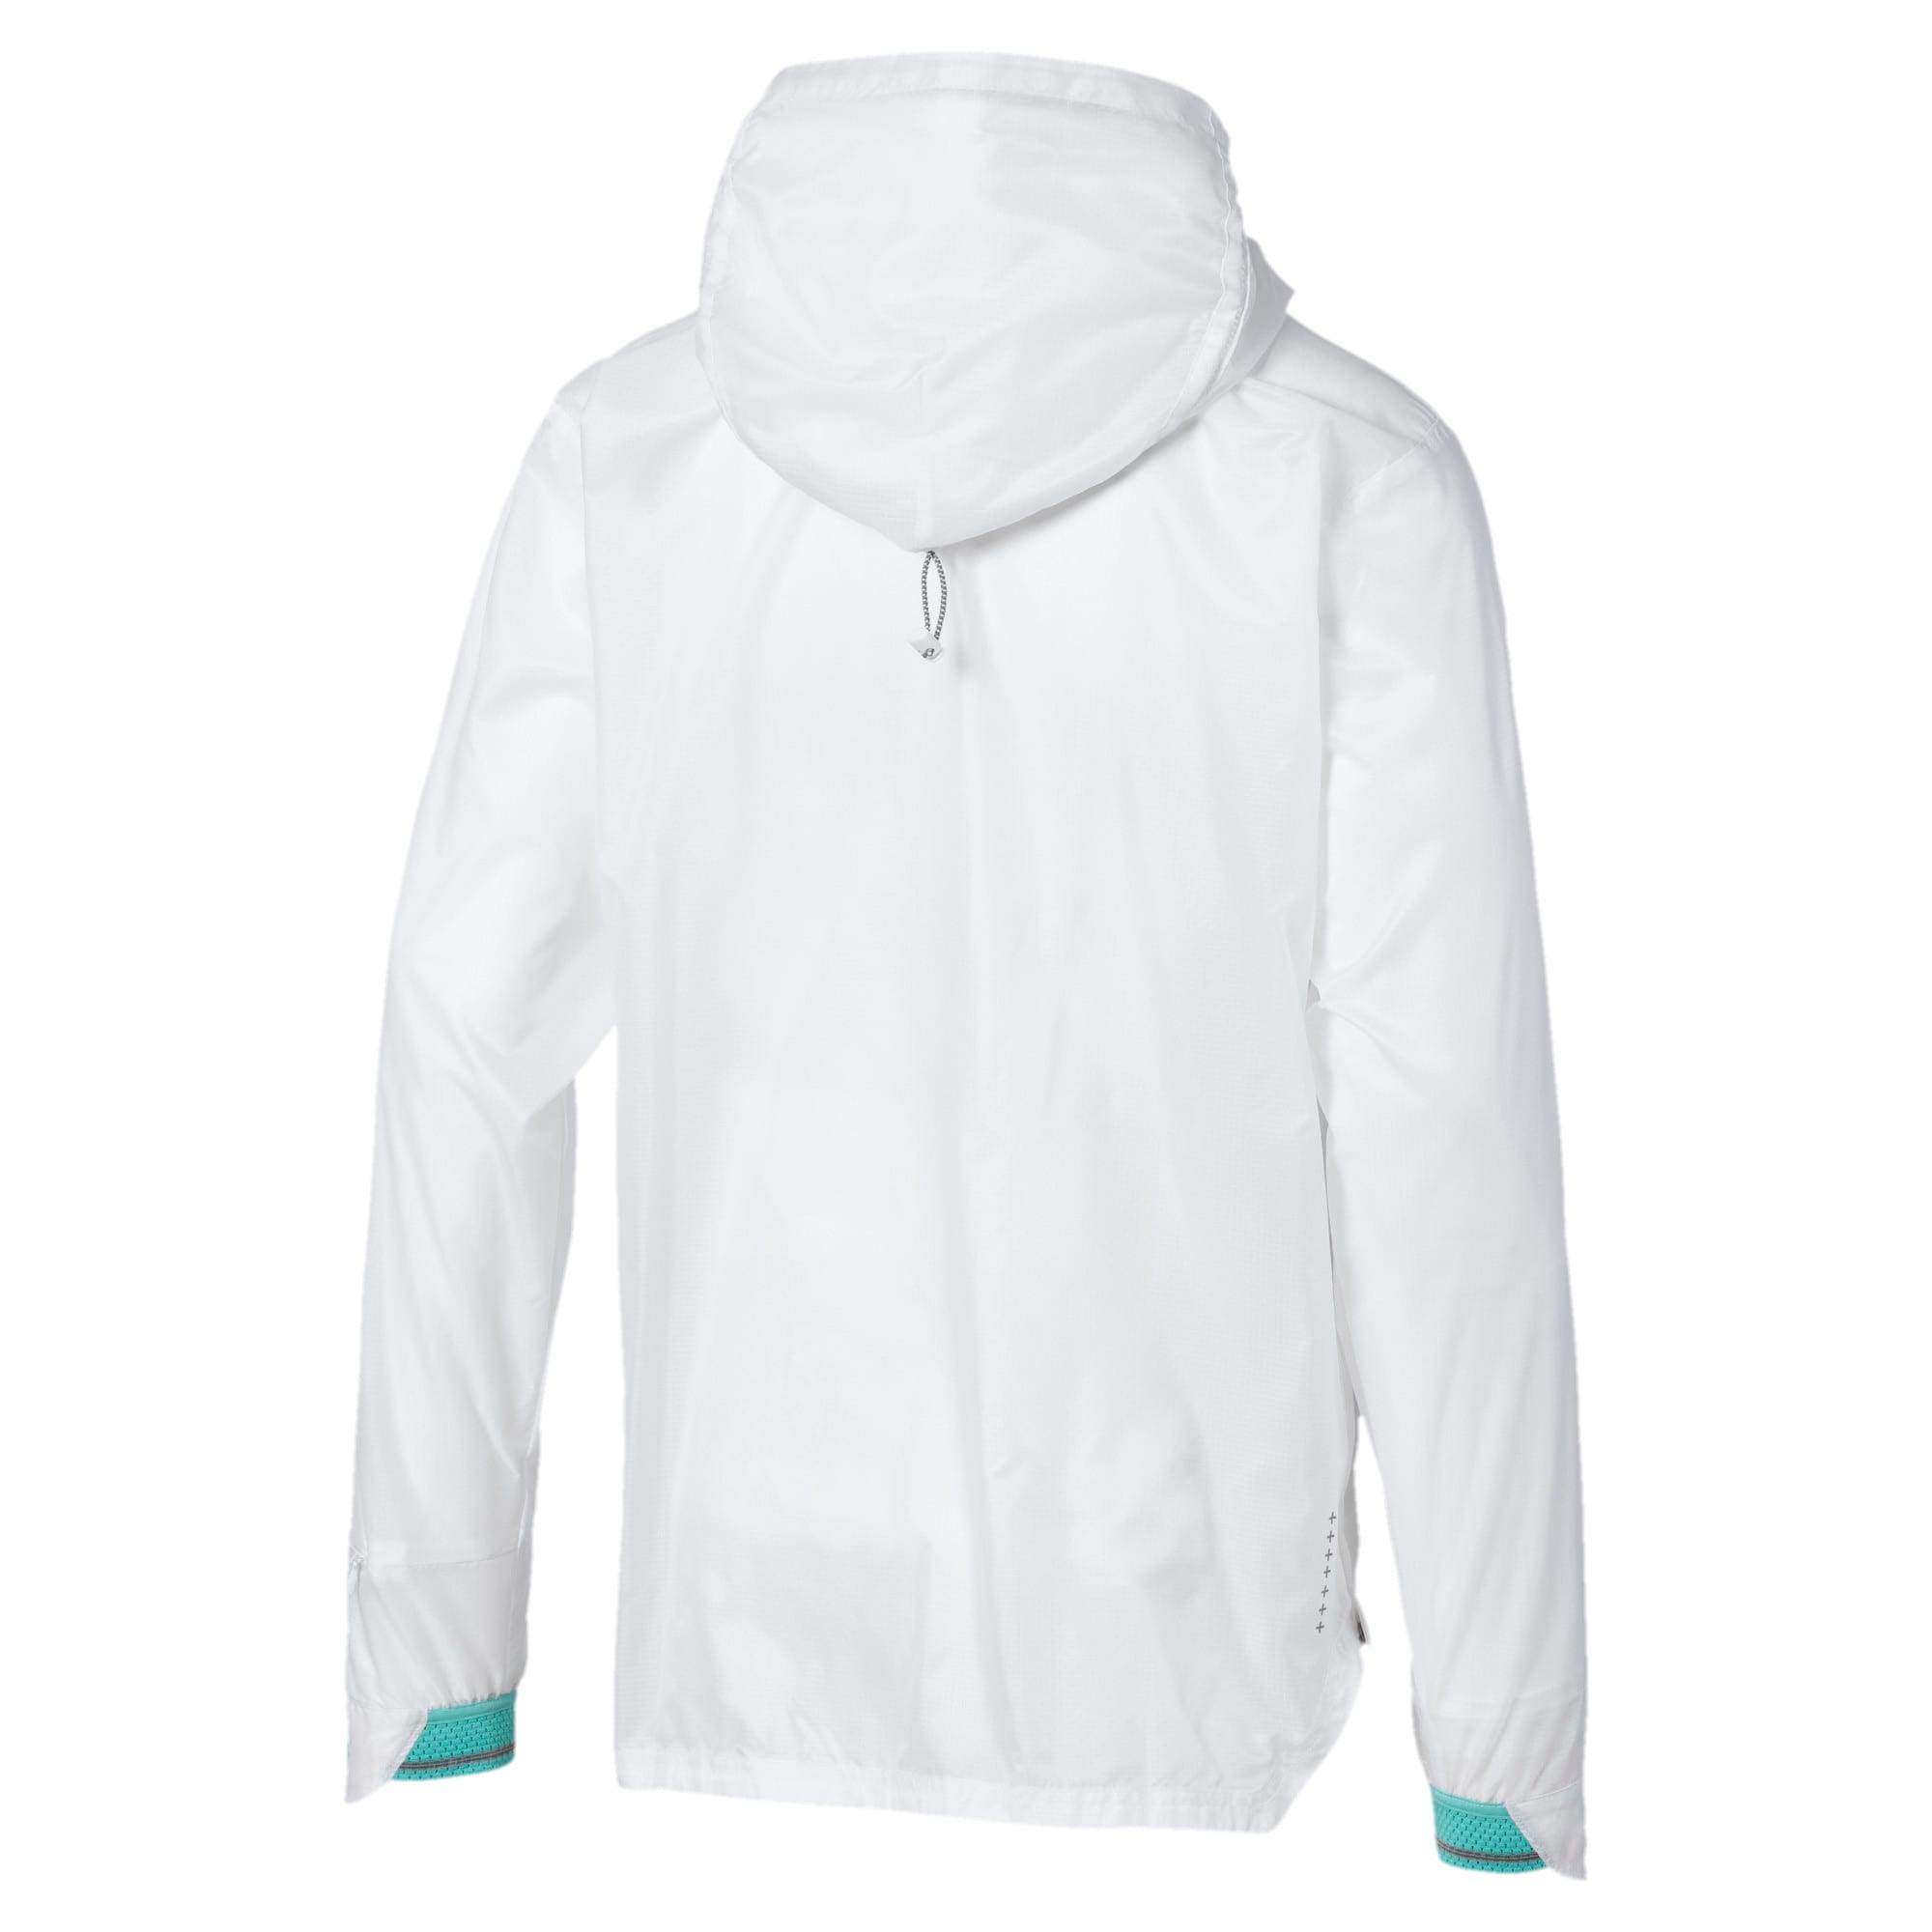 Thumbnail 5 of Get Fast Excite Woven Half Zip Men's Running Jacket, Puma White, medium-IND